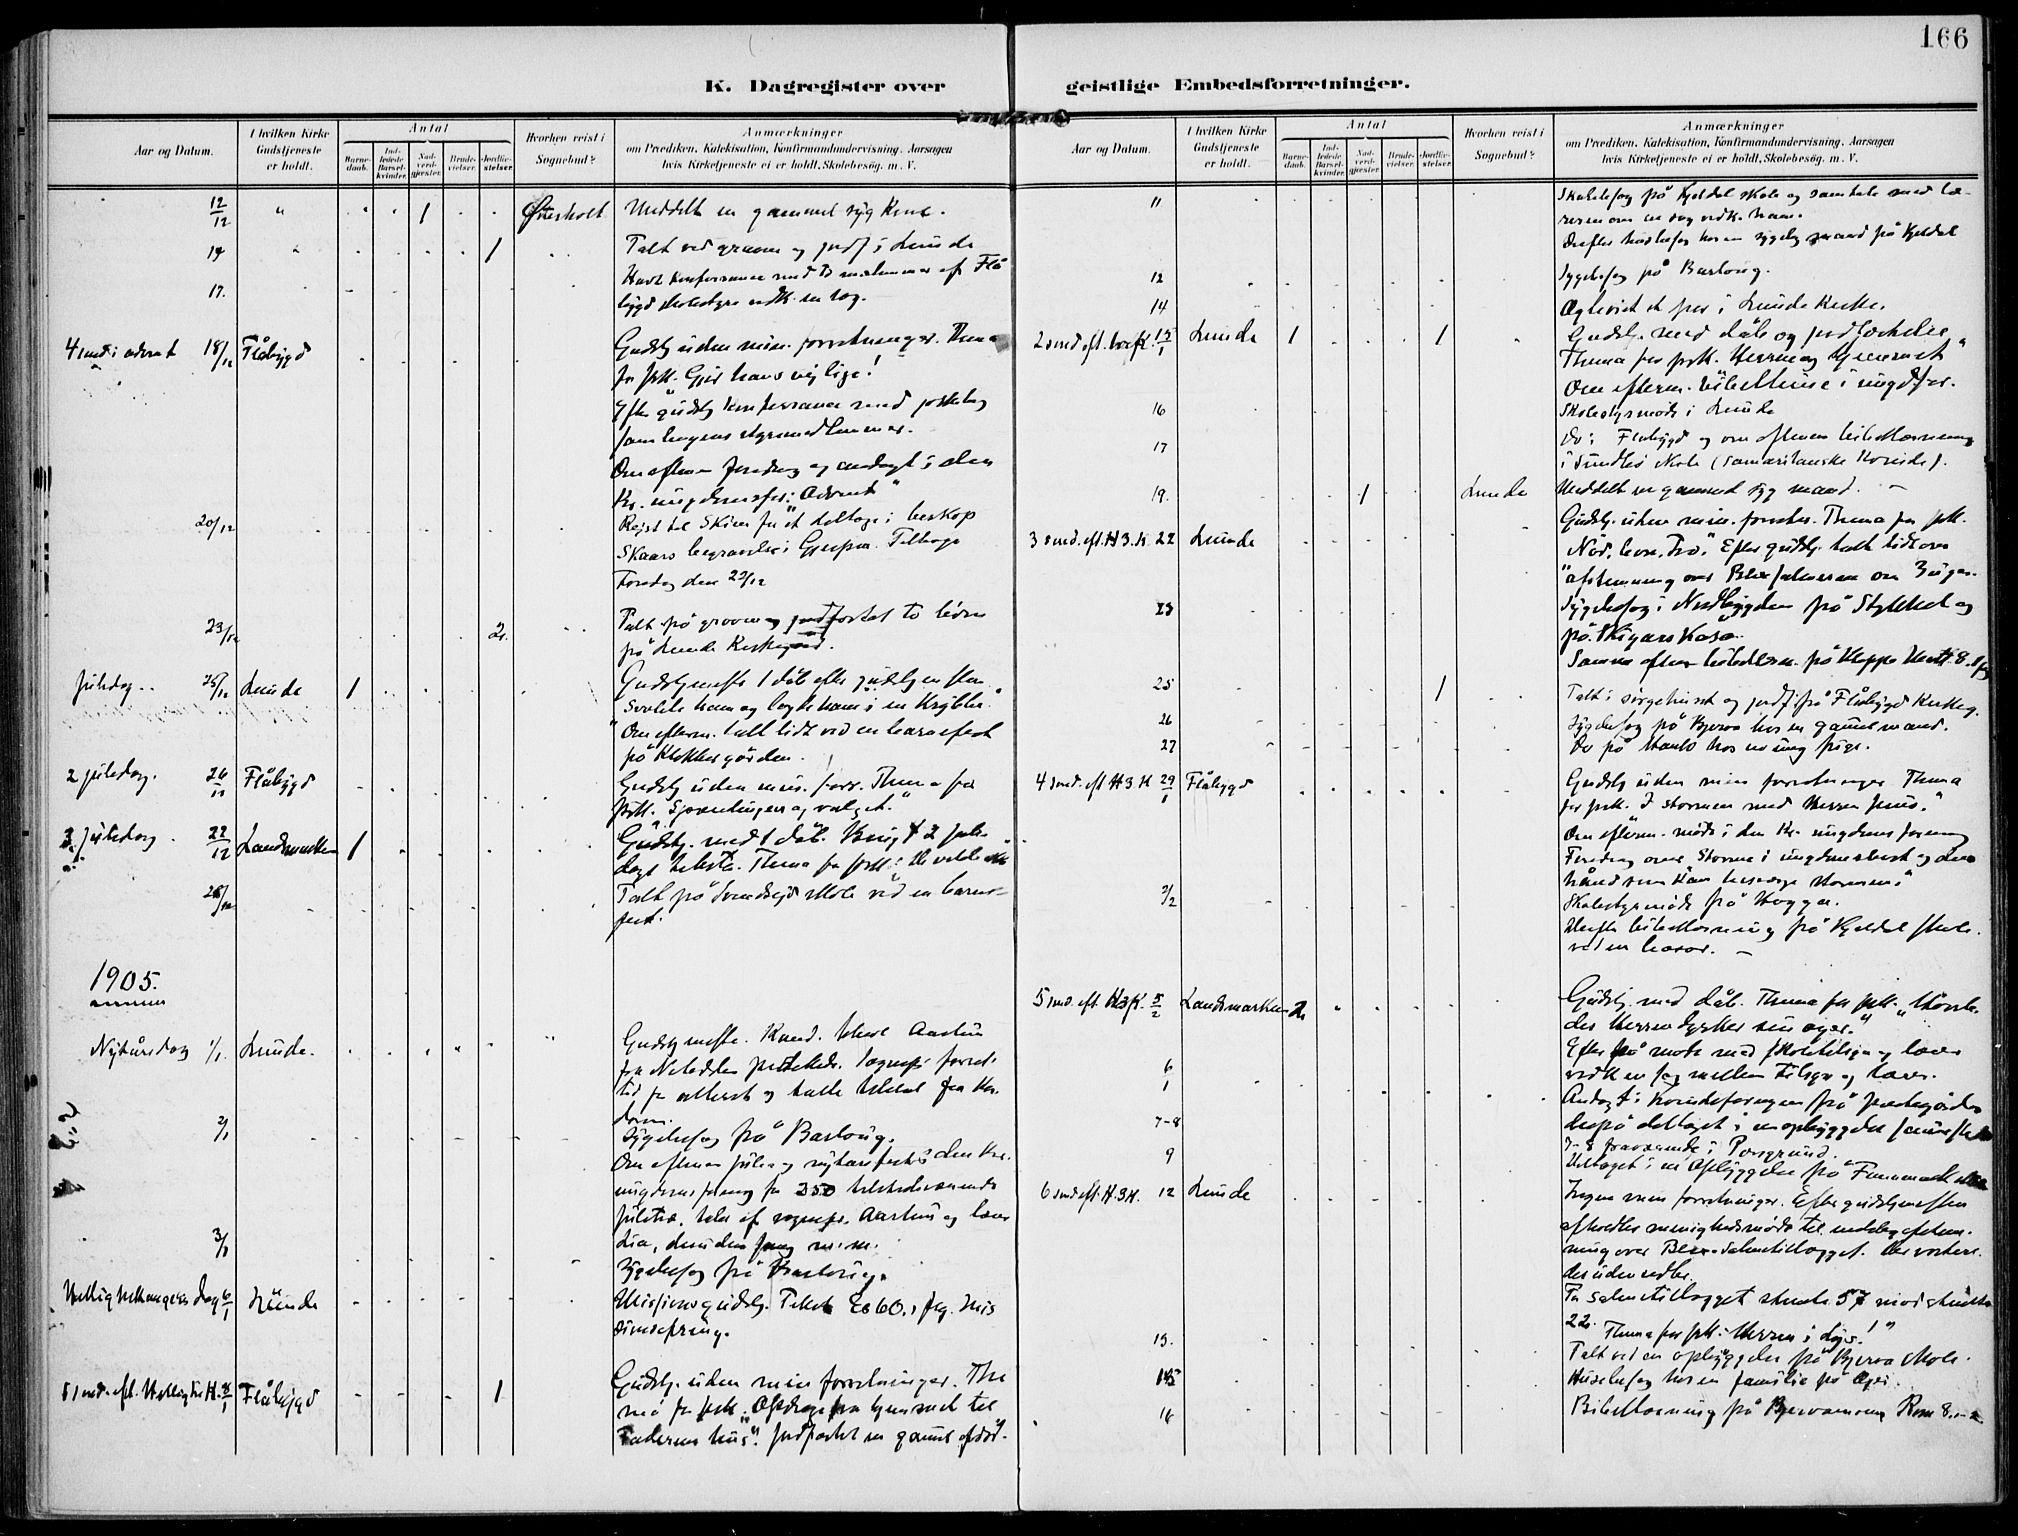 SAKO, Lunde kirkebøker, F/Fa/L0004: Ministerialbok nr. I 4, 1902-1913, s. 166